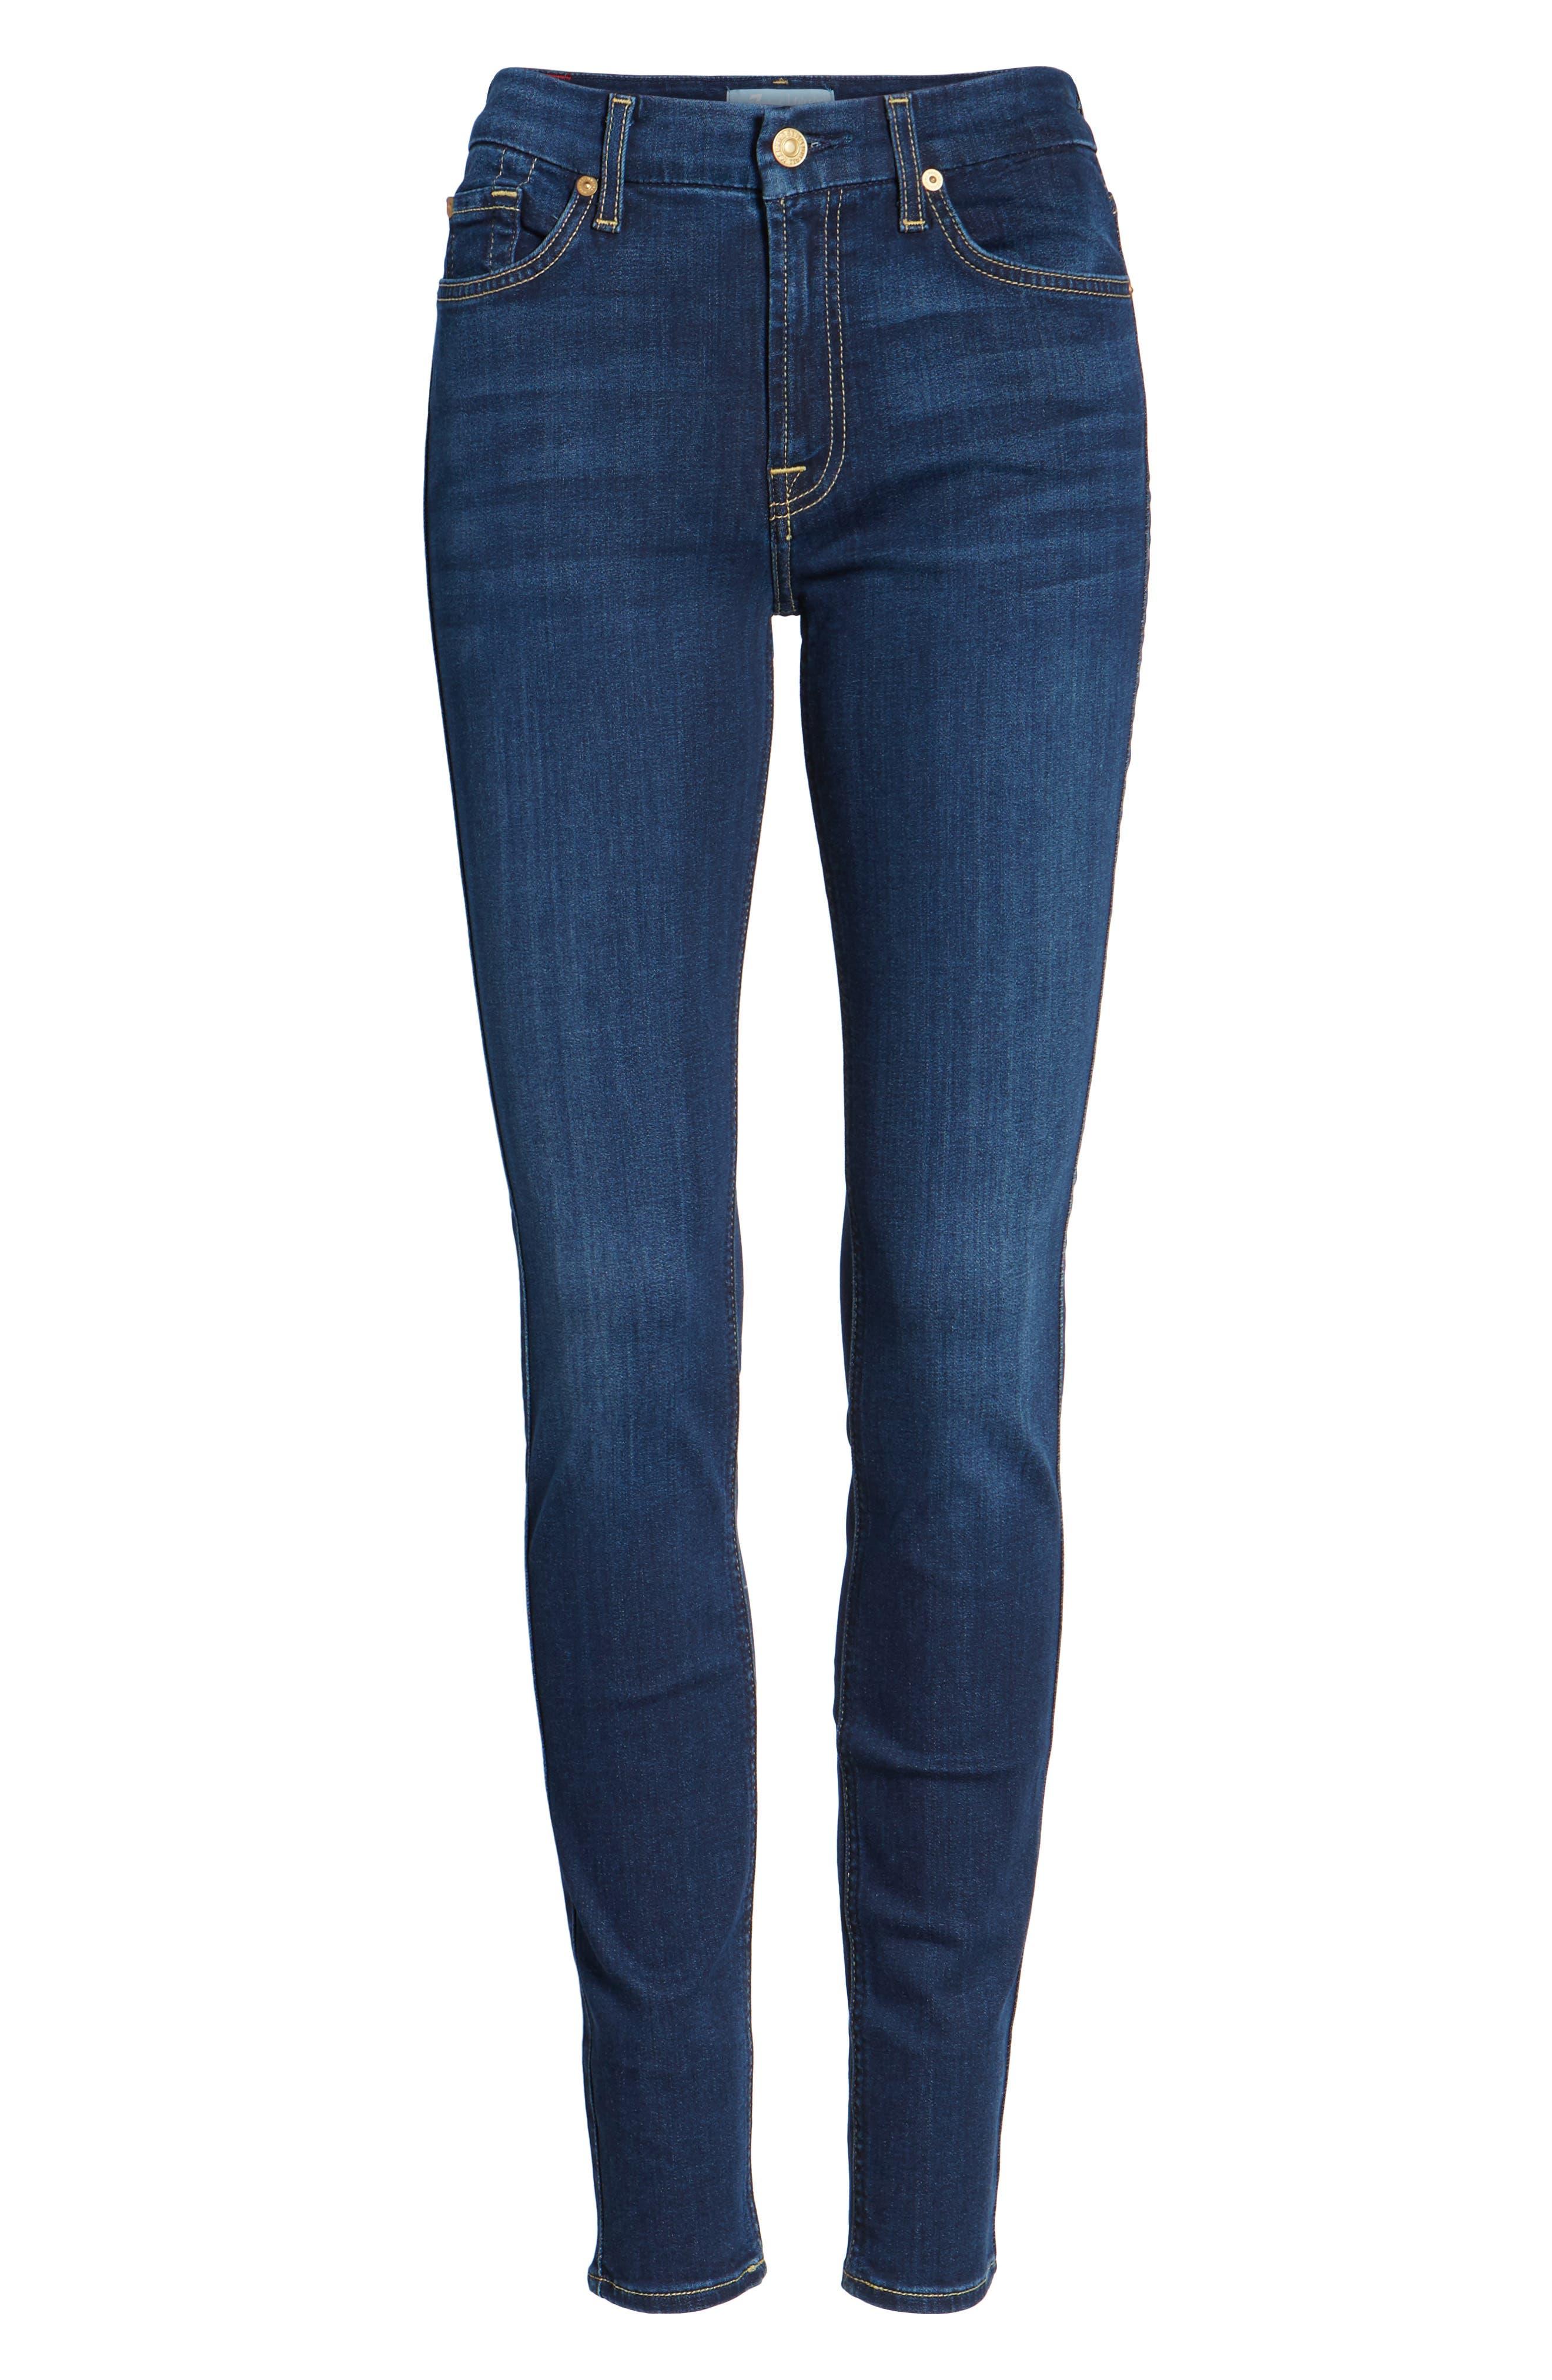 b(air) Skinny Jeans,                             Alternate thumbnail 2, color,                             400